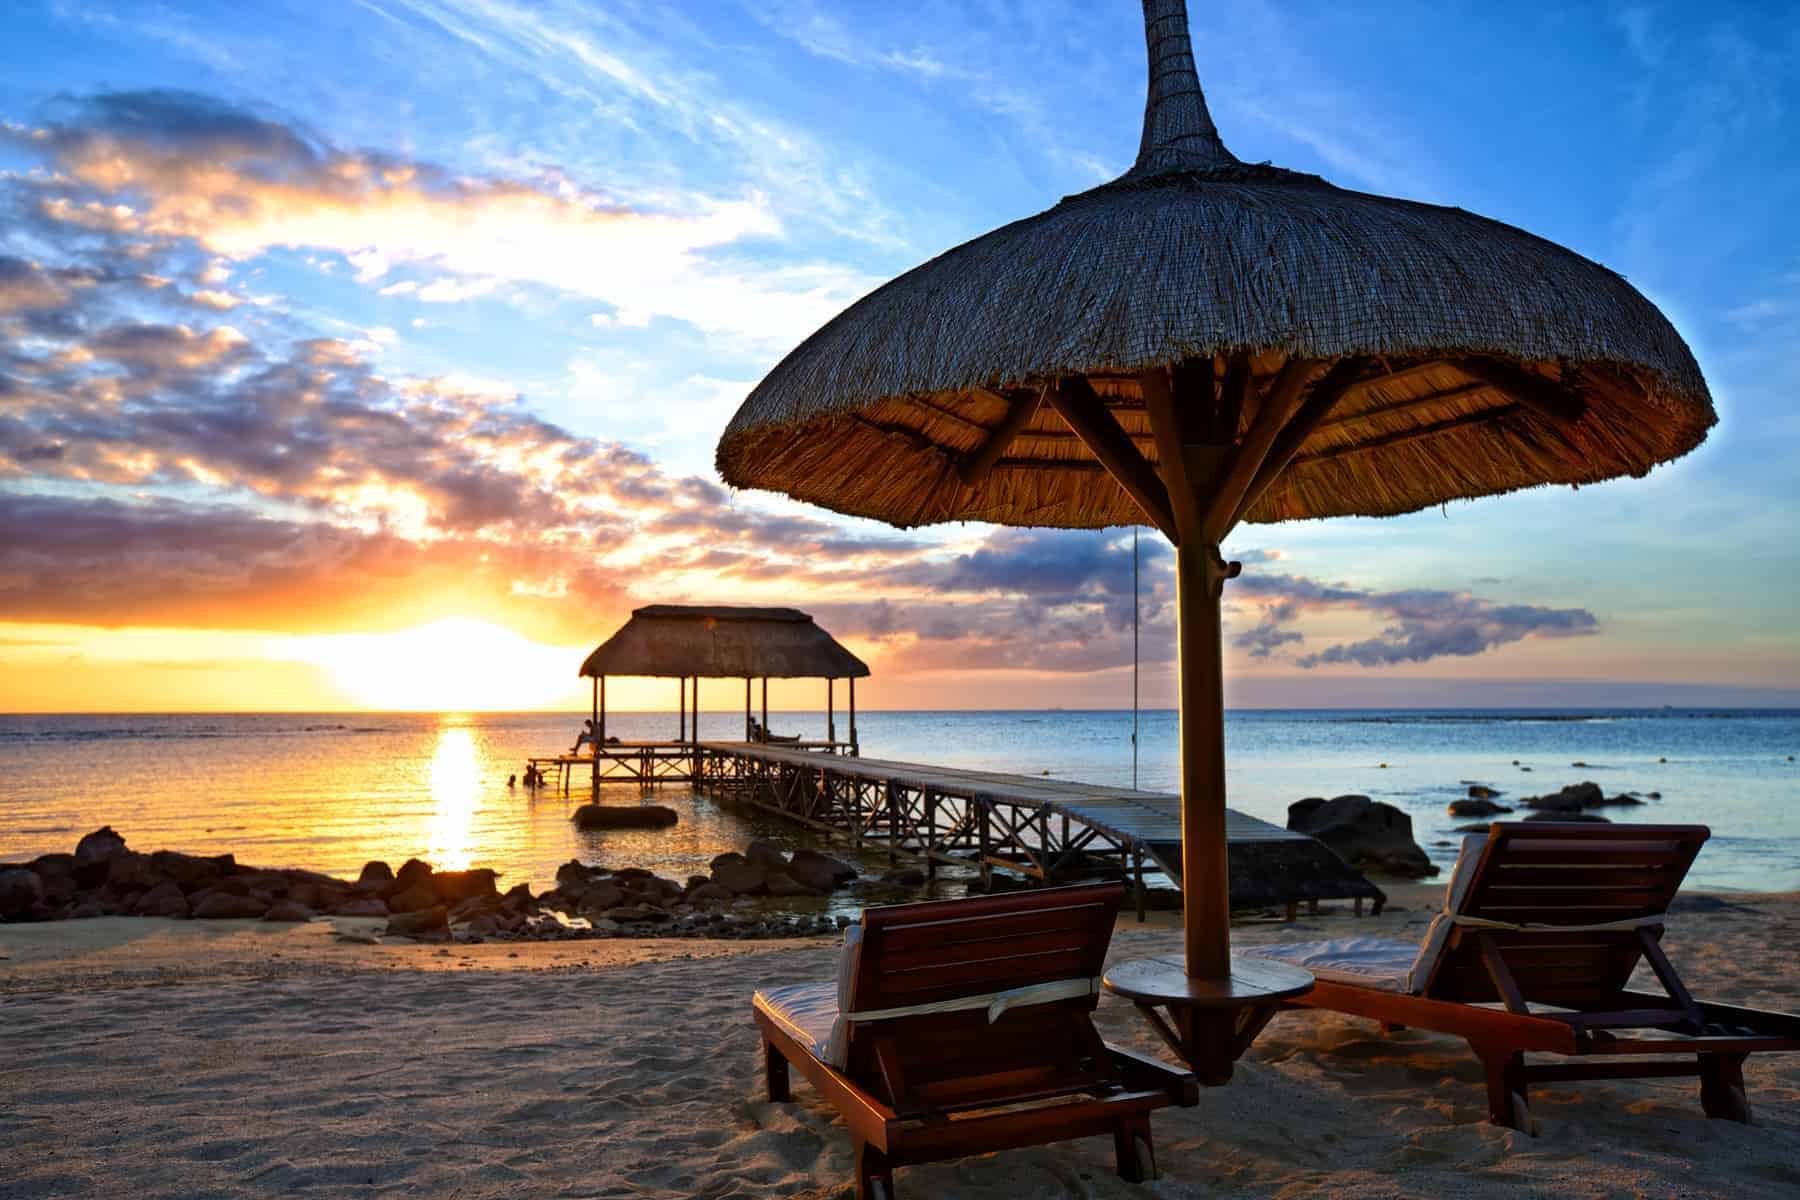 Beautiful sunset in Mauritius Island